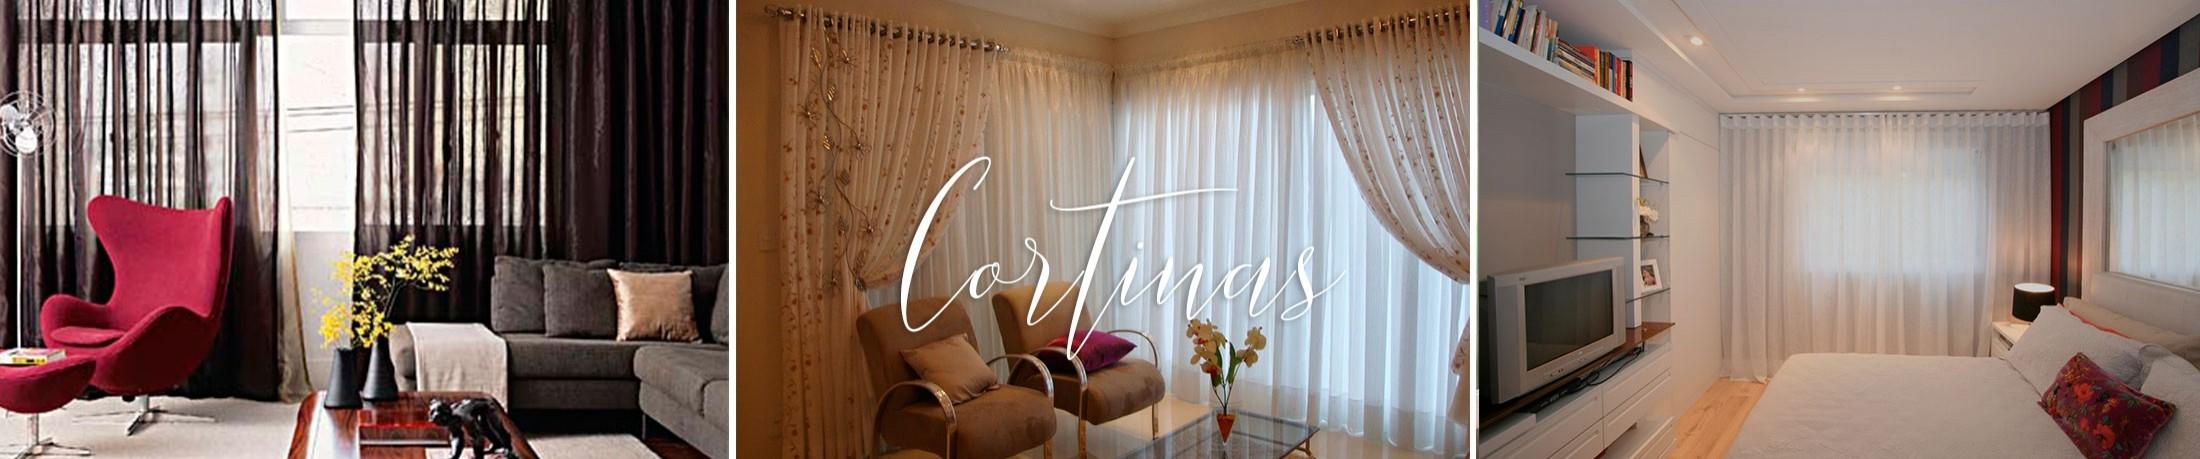 cortina-branca-para-quarto-maiscortinas-banner1